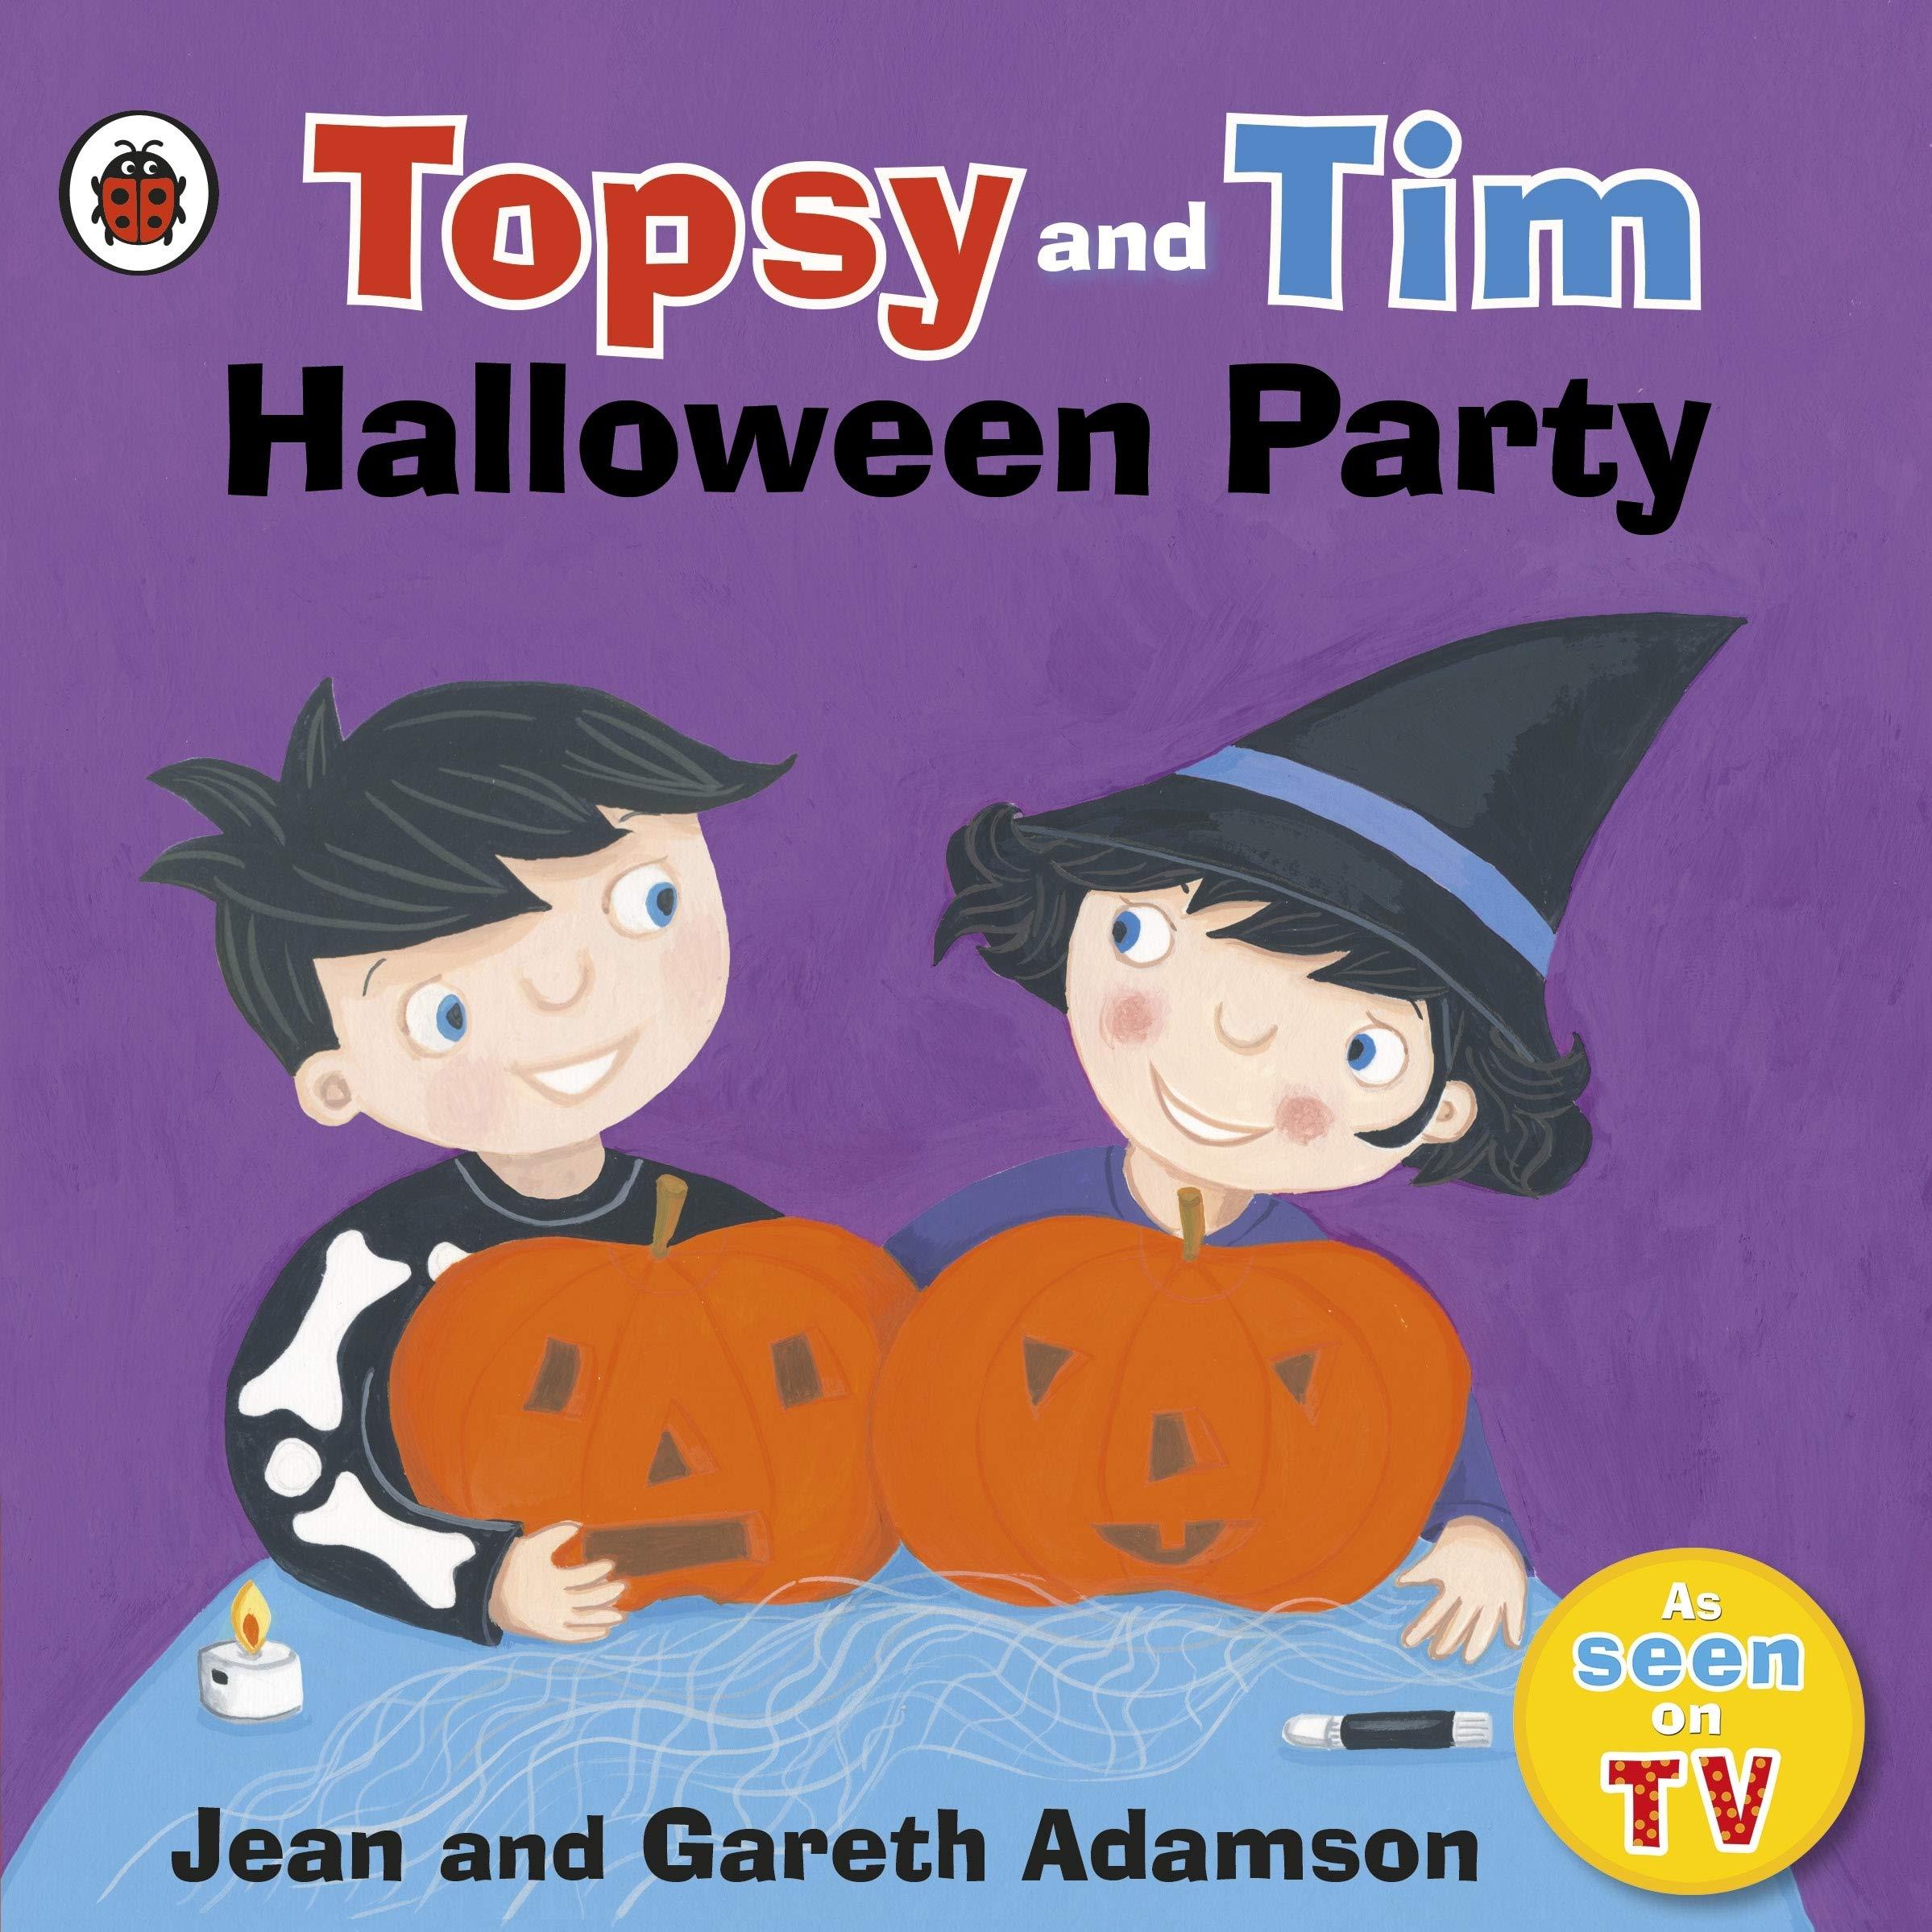 Topsy and Tim: Halloween Party (Topsy & Tim): Amazon.co.uk: Adamson, Jean,  Adamson, Gareth: 9780241386163: Books